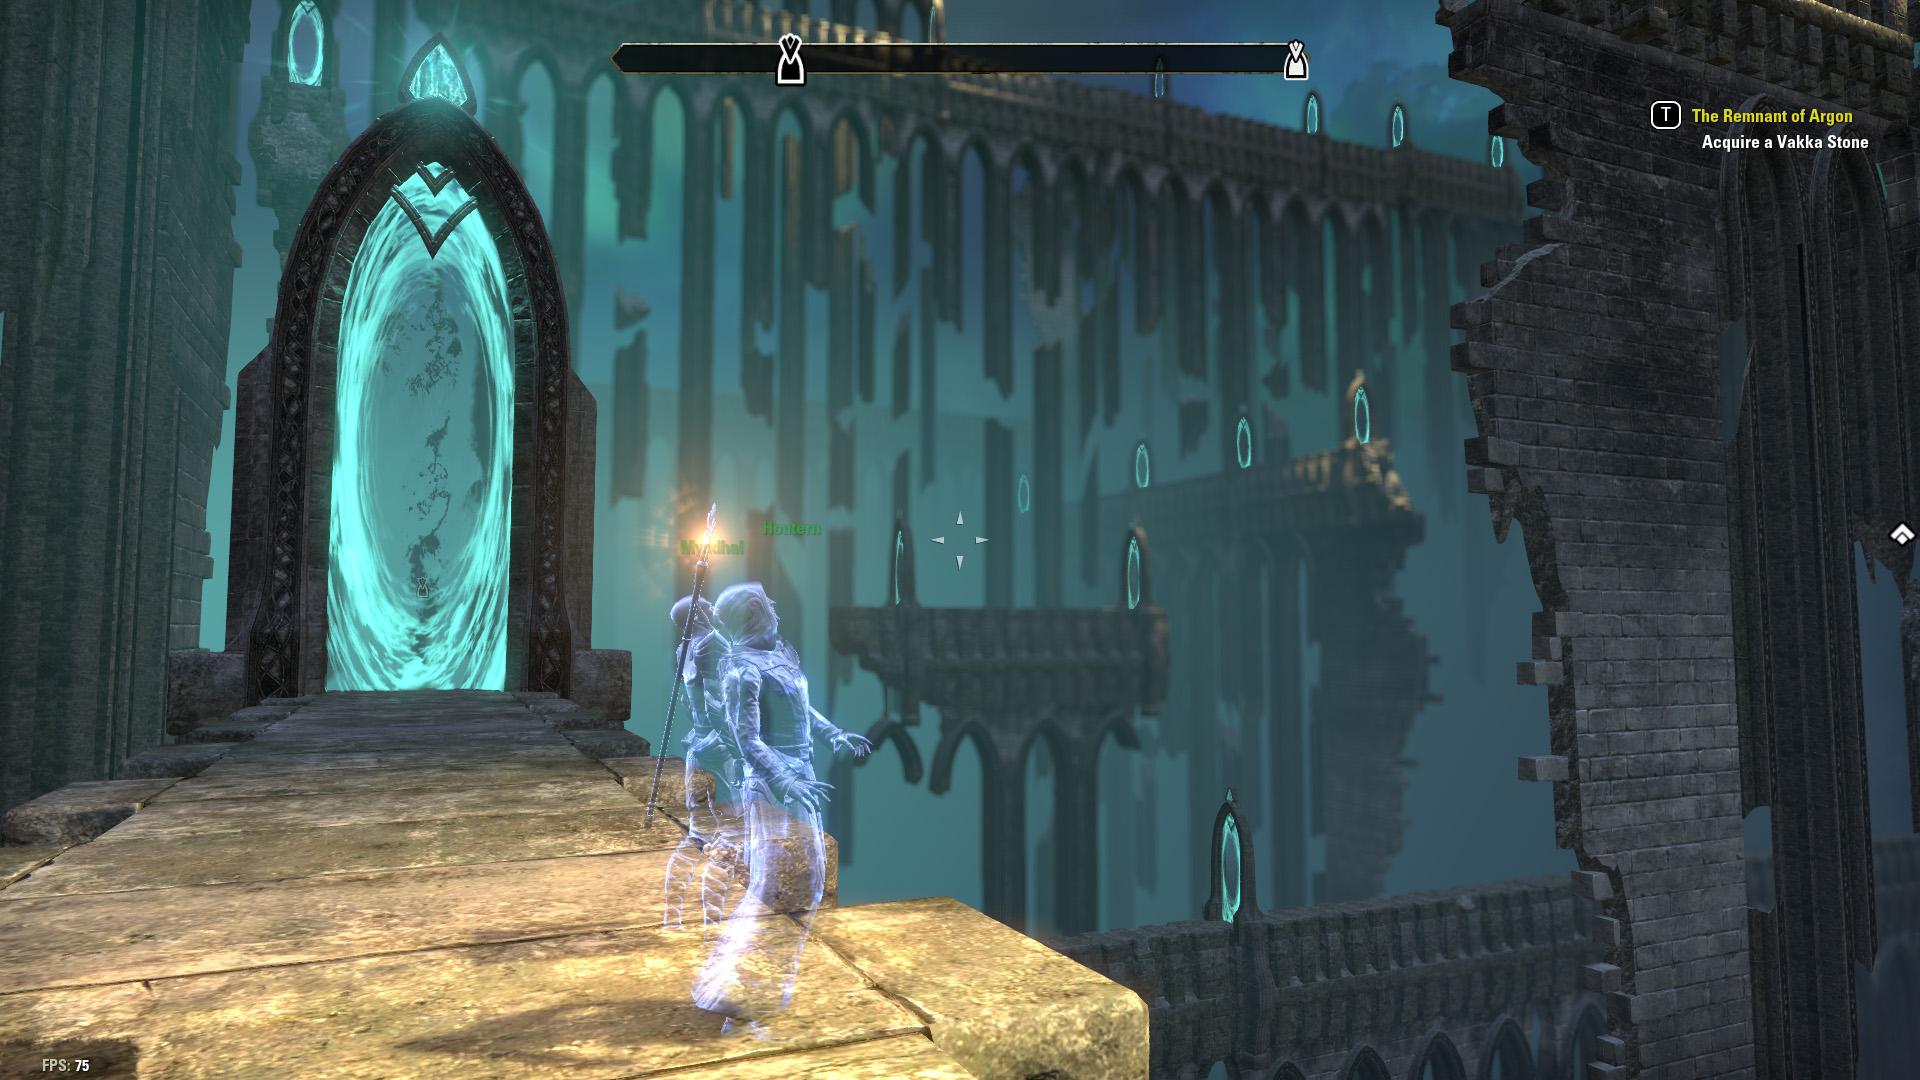 The Elder Scrolls Online Murkmire DLC